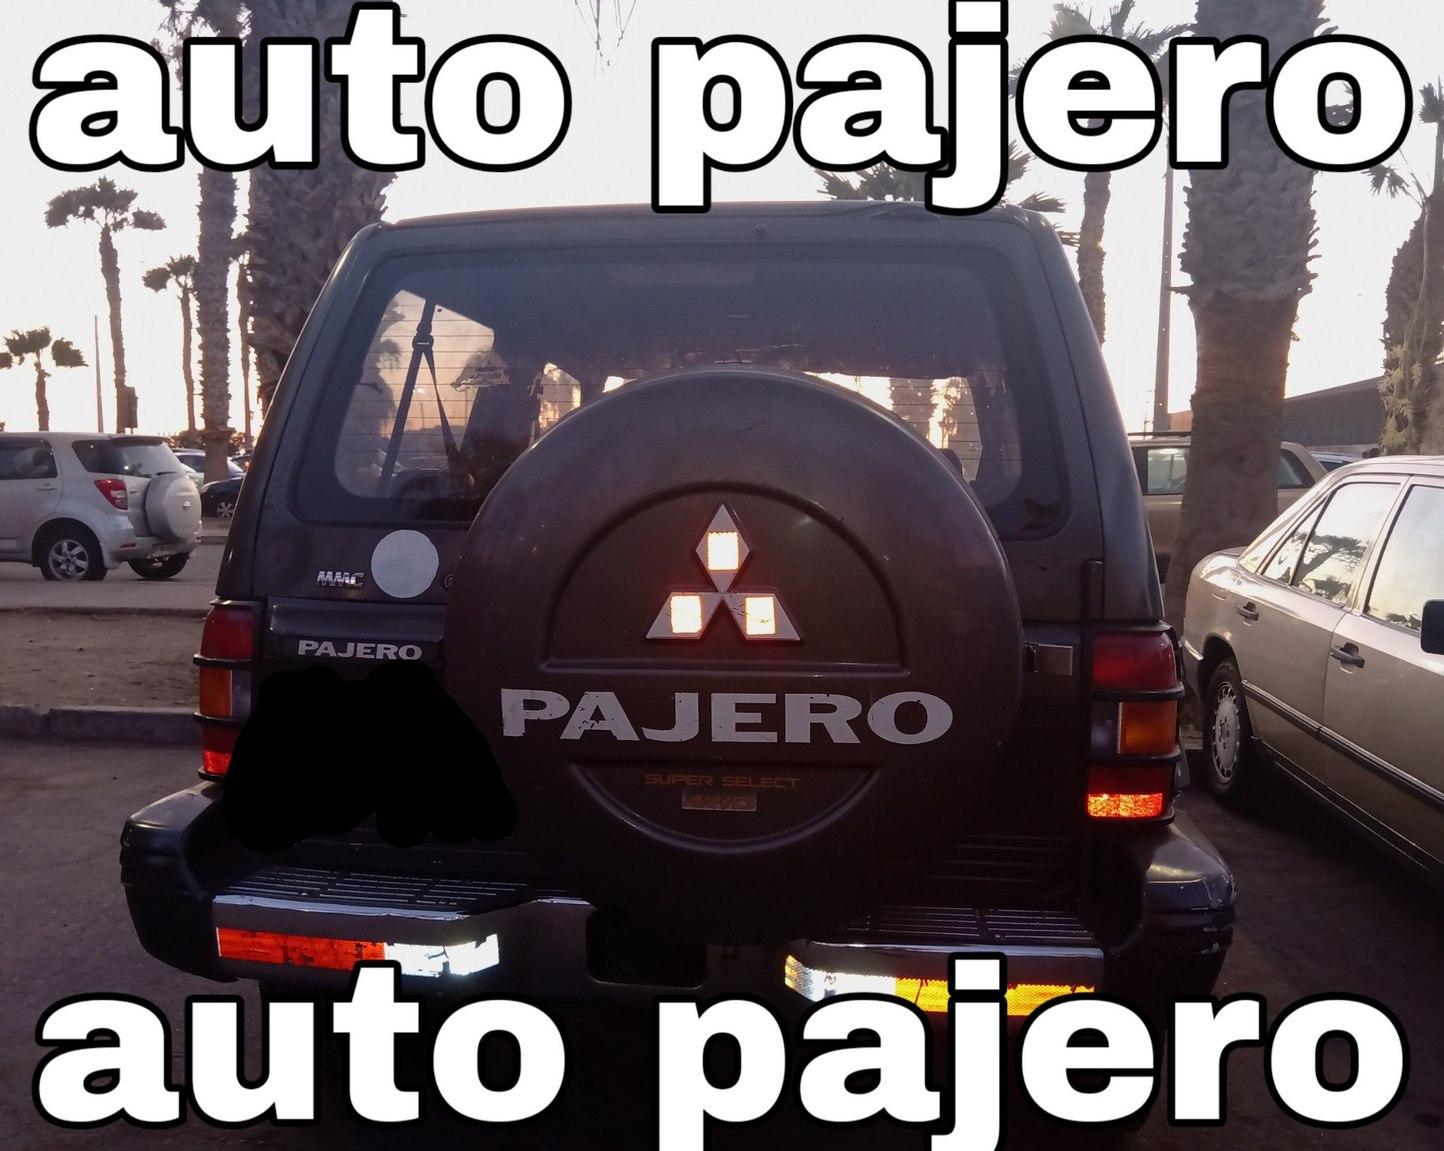 Auto pajero auto pajero - meme